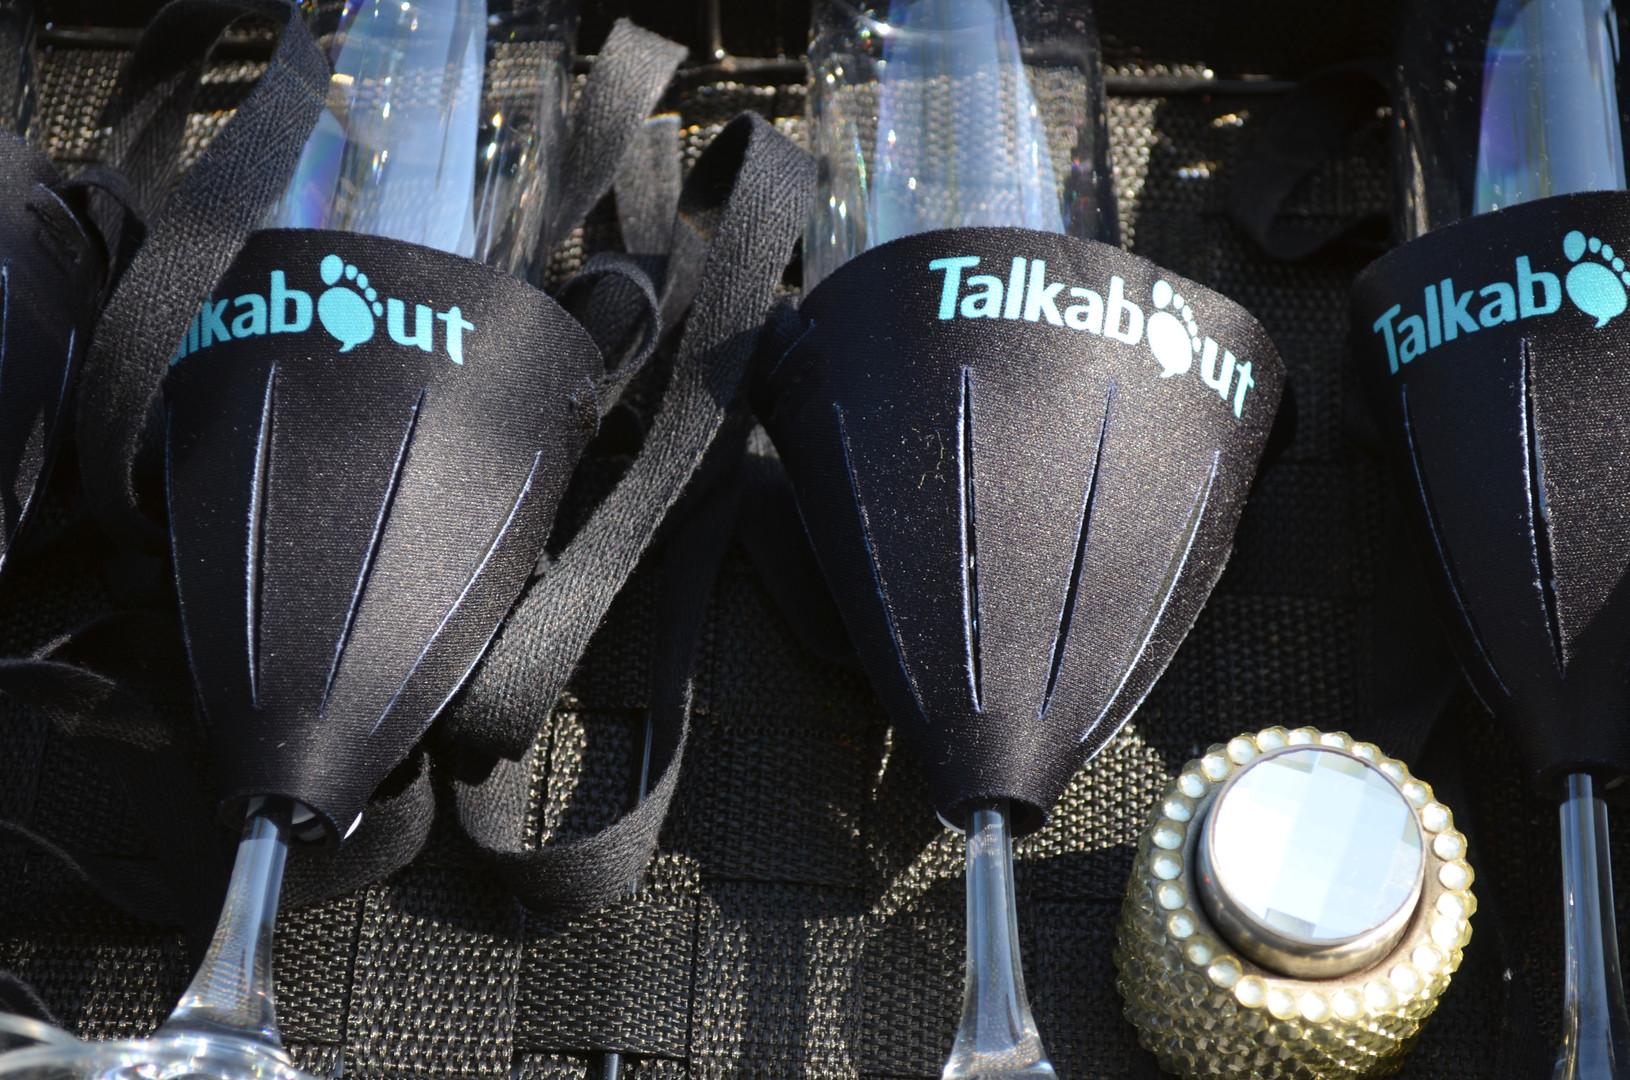 wine glasses talkabout.JPG